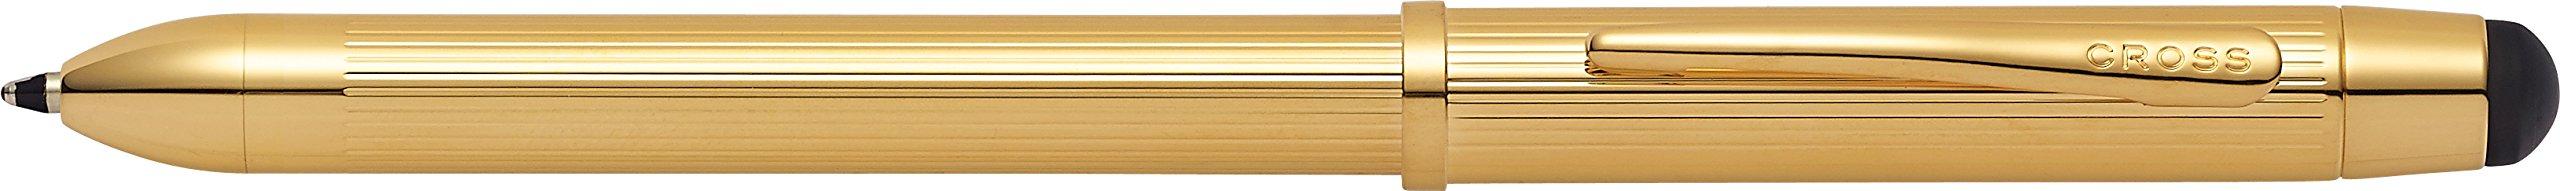 Cross Tech3  23kt Gold Plate Multifunction Pen